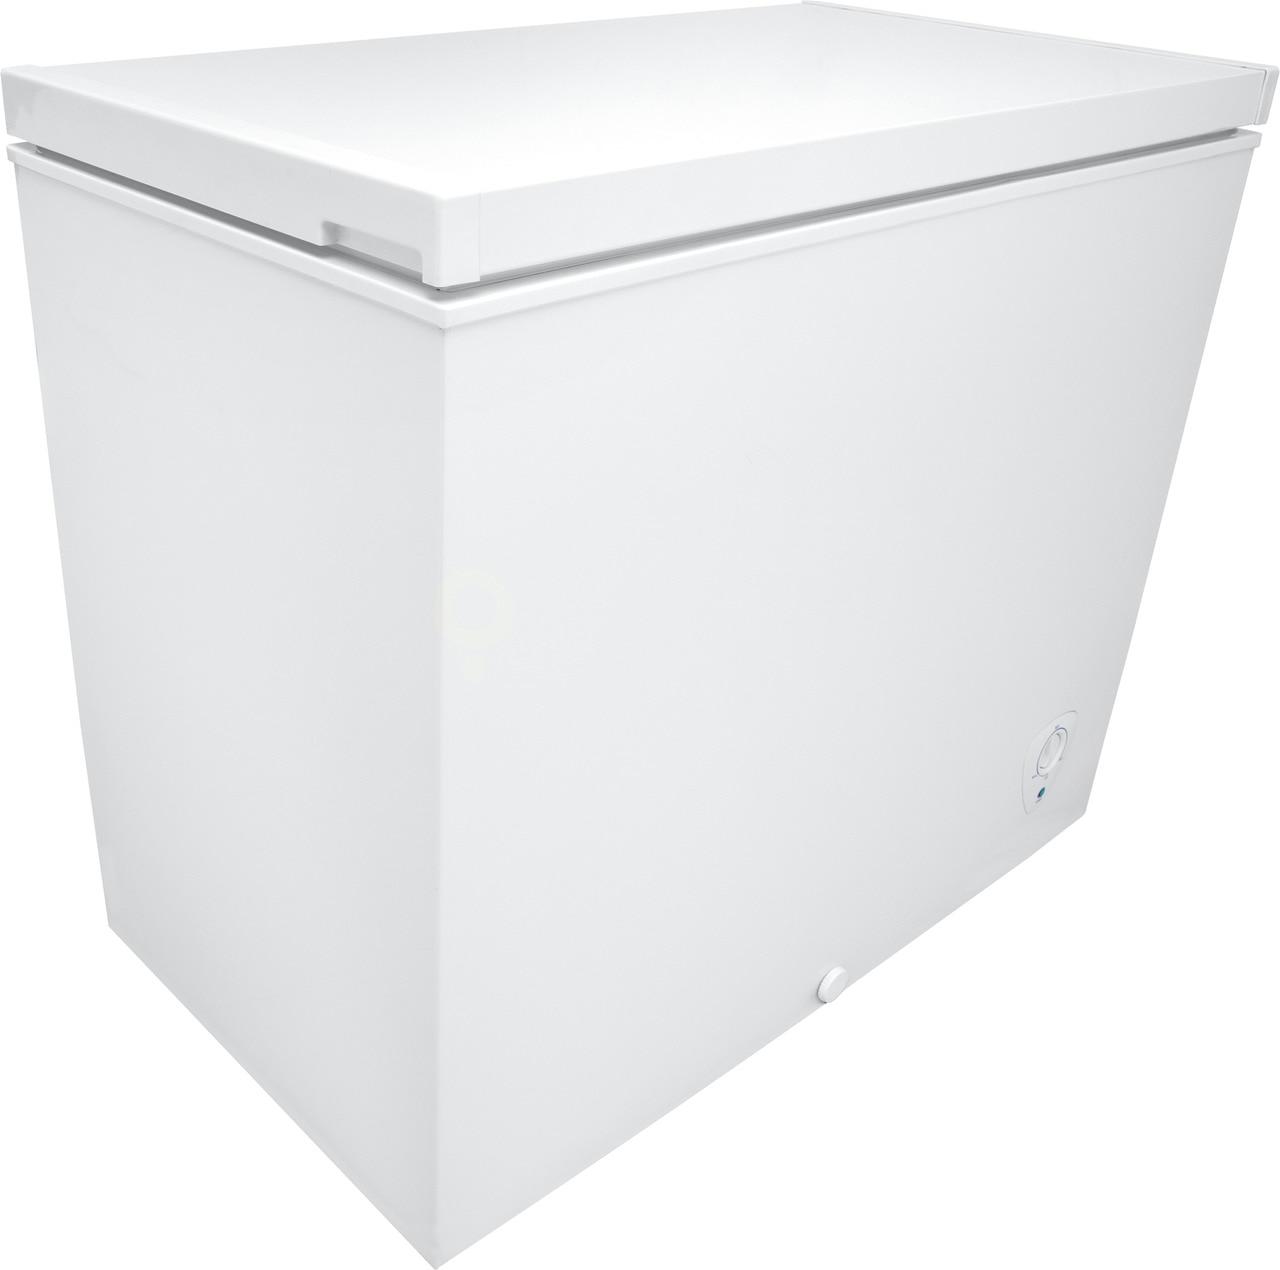 Model: FFFC09M1RW | Frigidaire 8.7 Cu. Ft. Chest Freezer